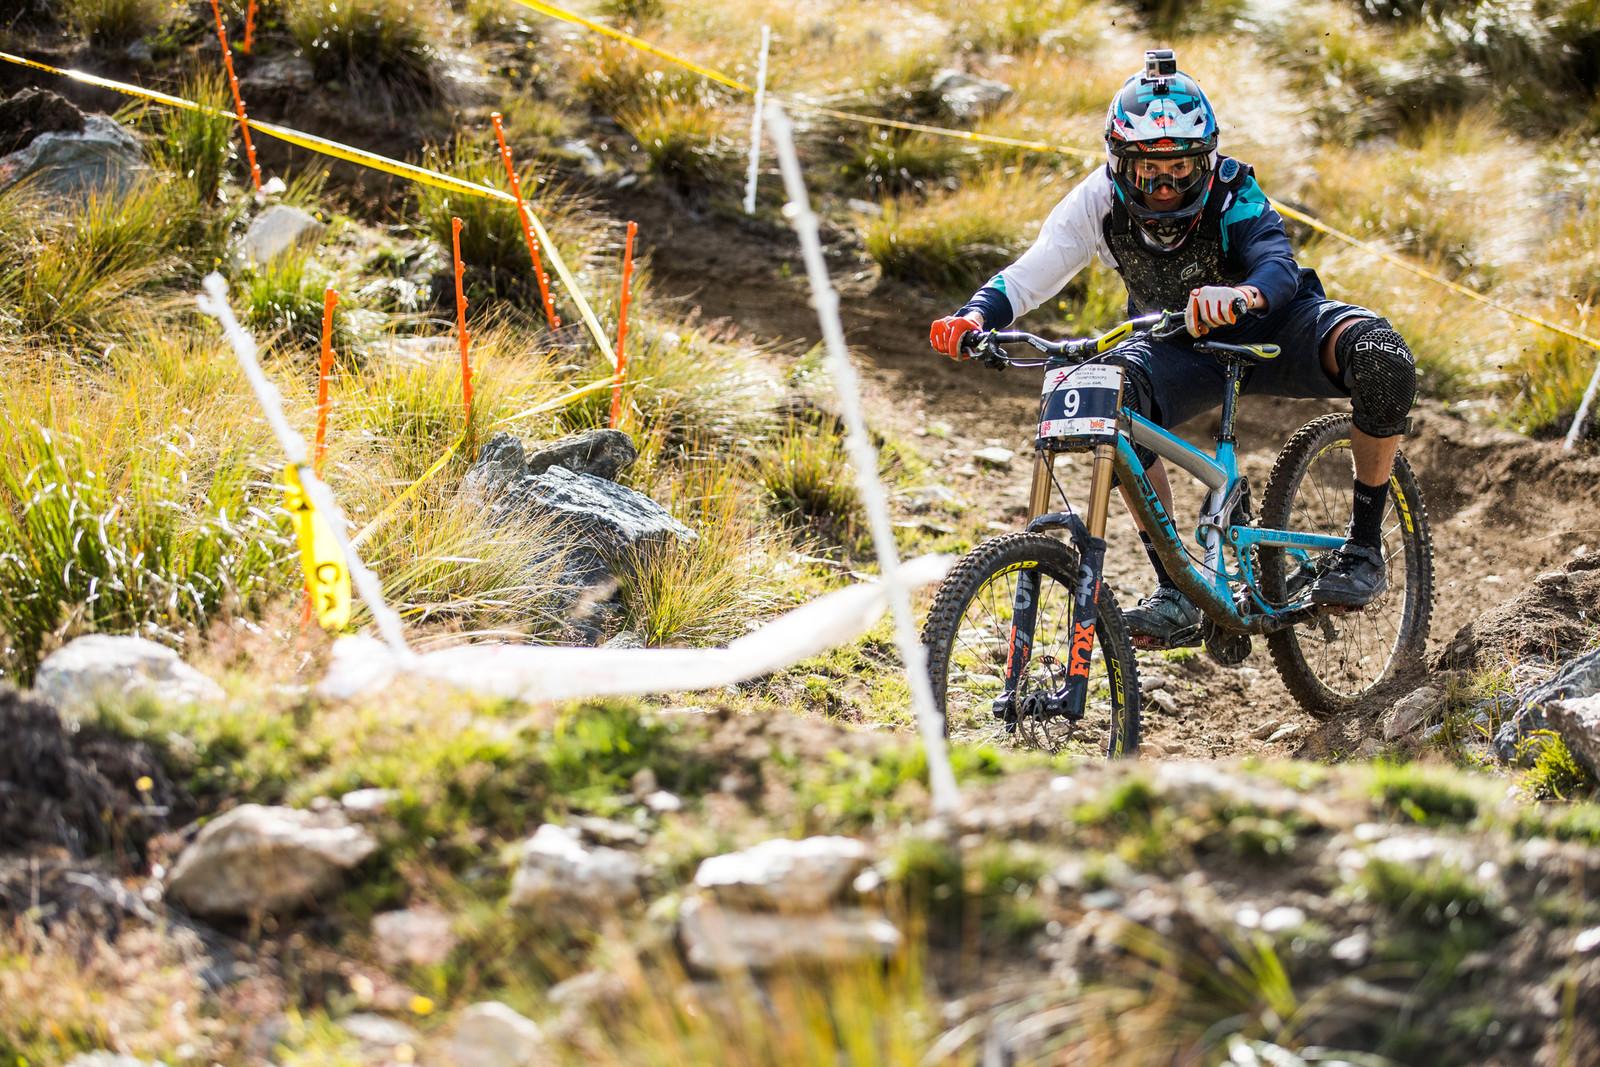 Josh Barthe - Blenki, Brook & More - 2018 NZ National Champs Day 1 - Mountain Biking Pictures - Vital MTB